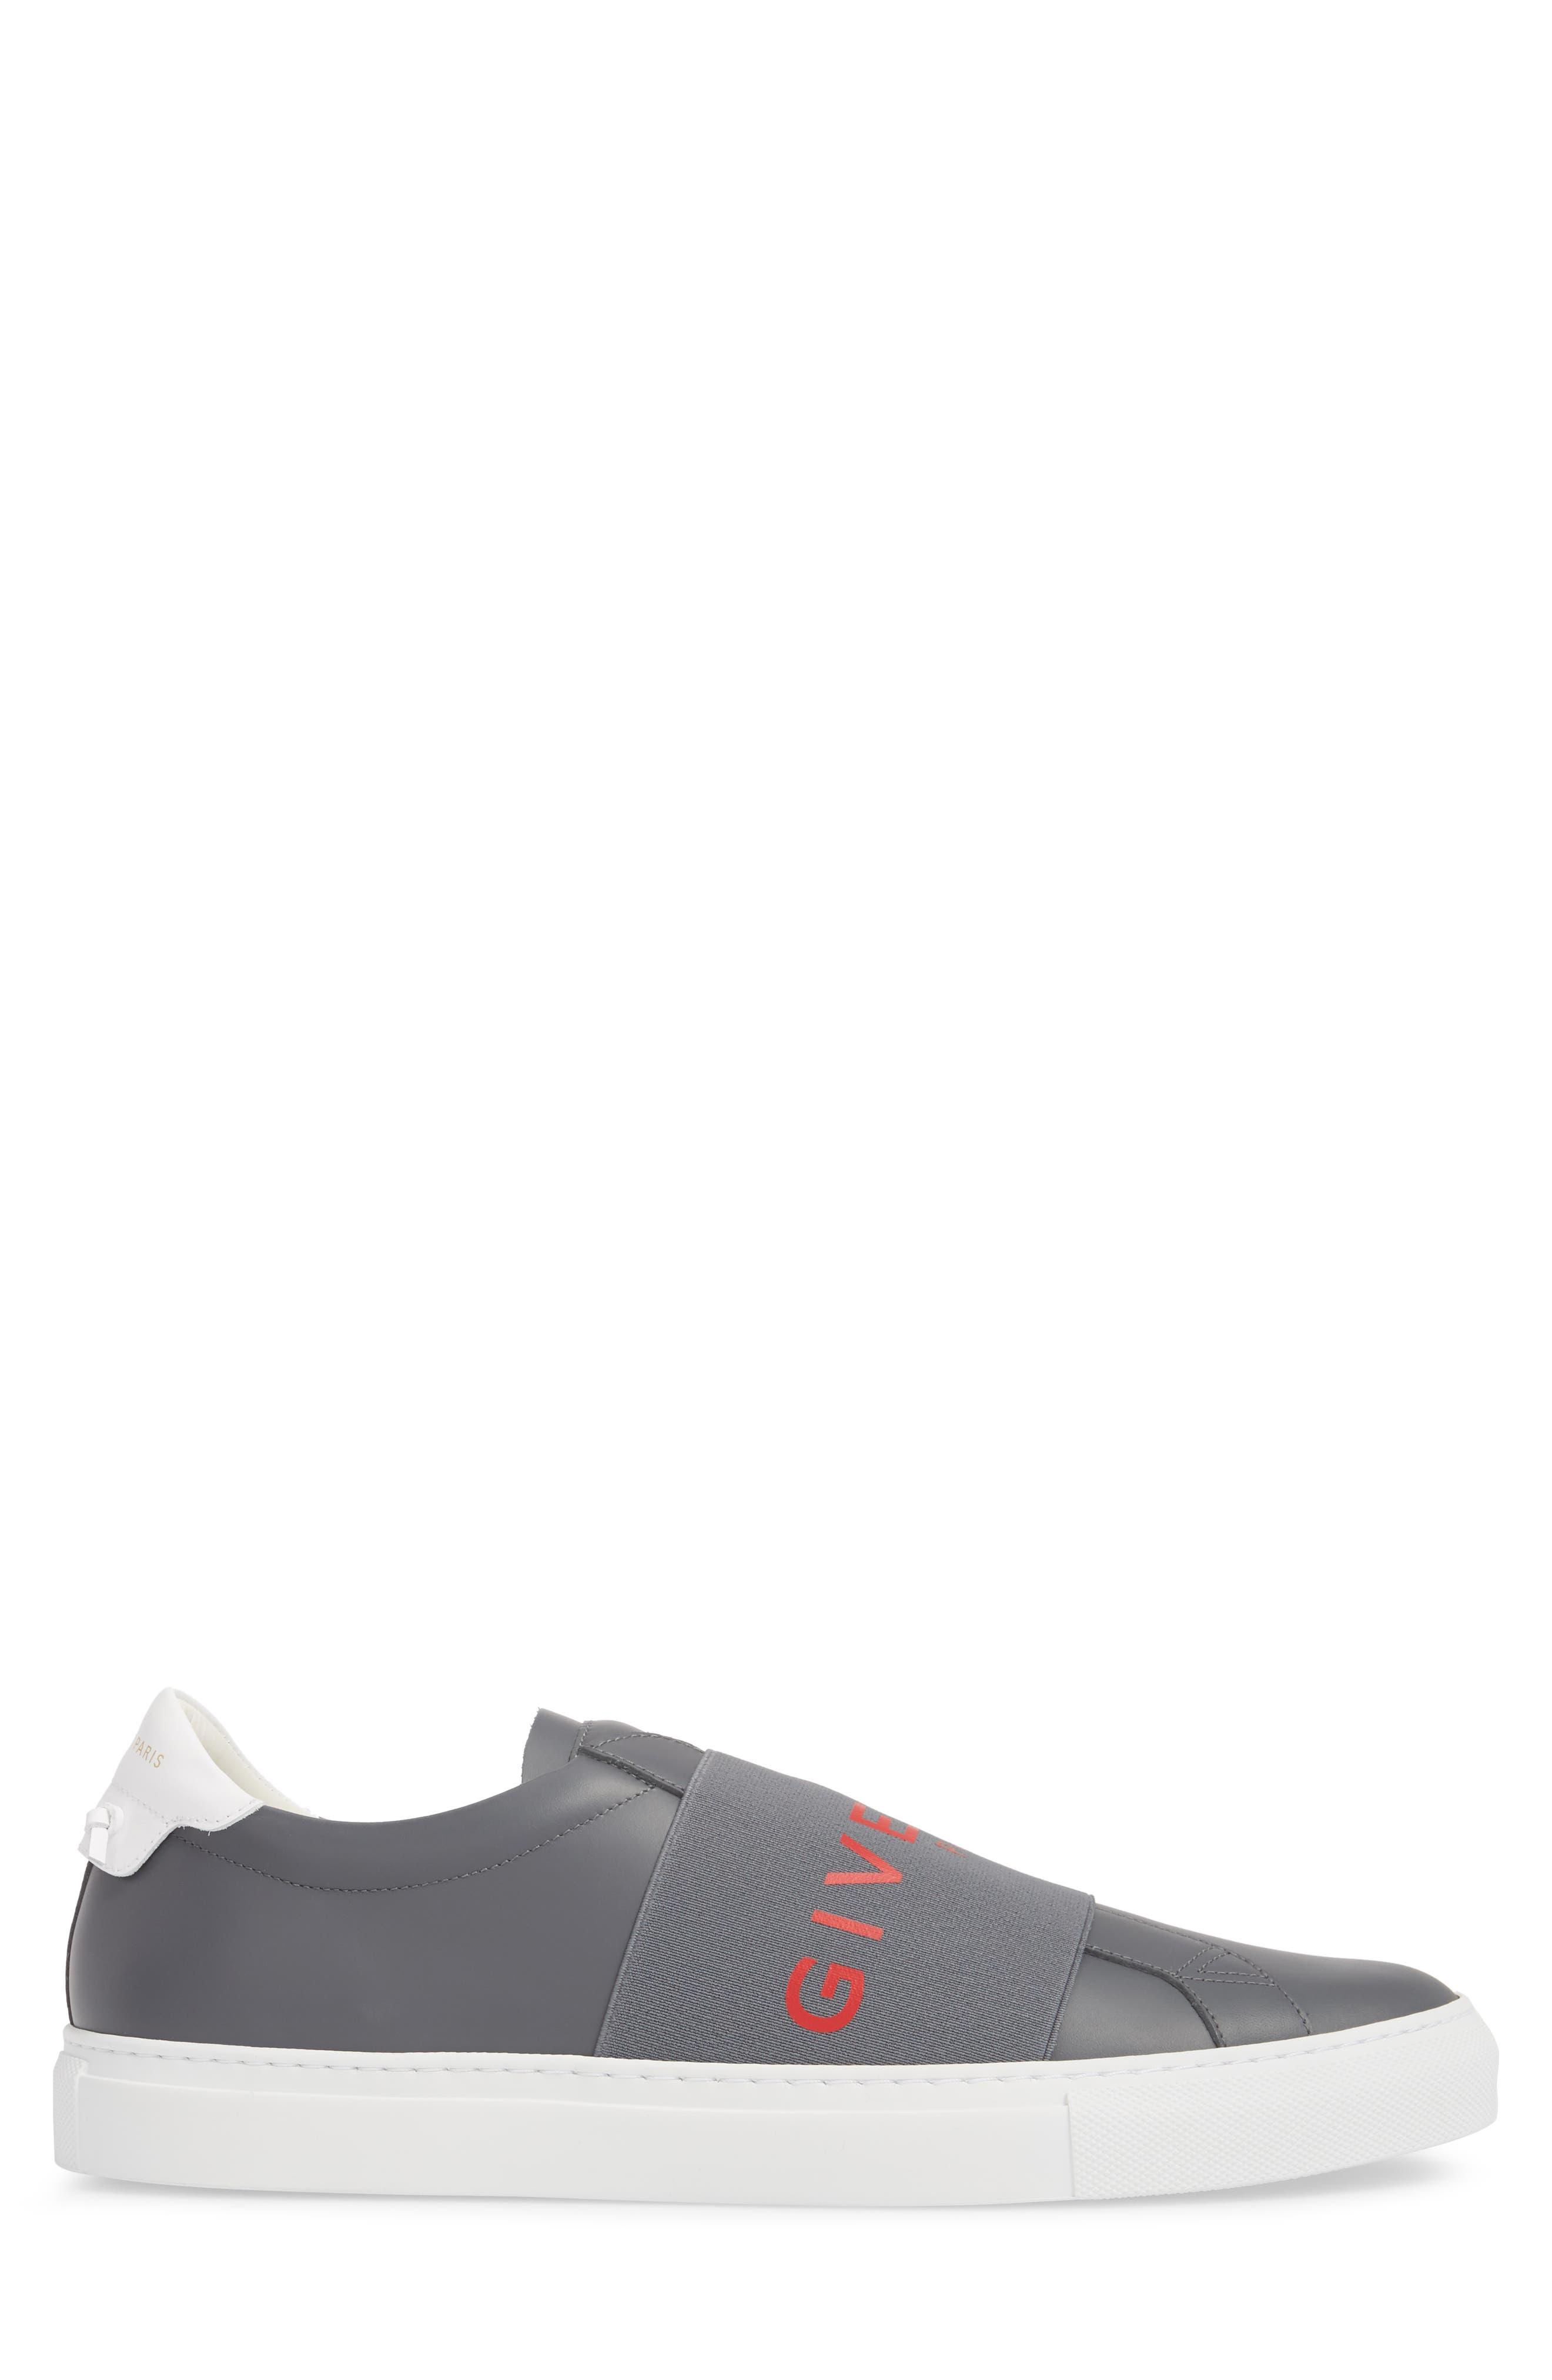 Urban Knots Sneaker,                             Alternate thumbnail 3, color,                             Grey